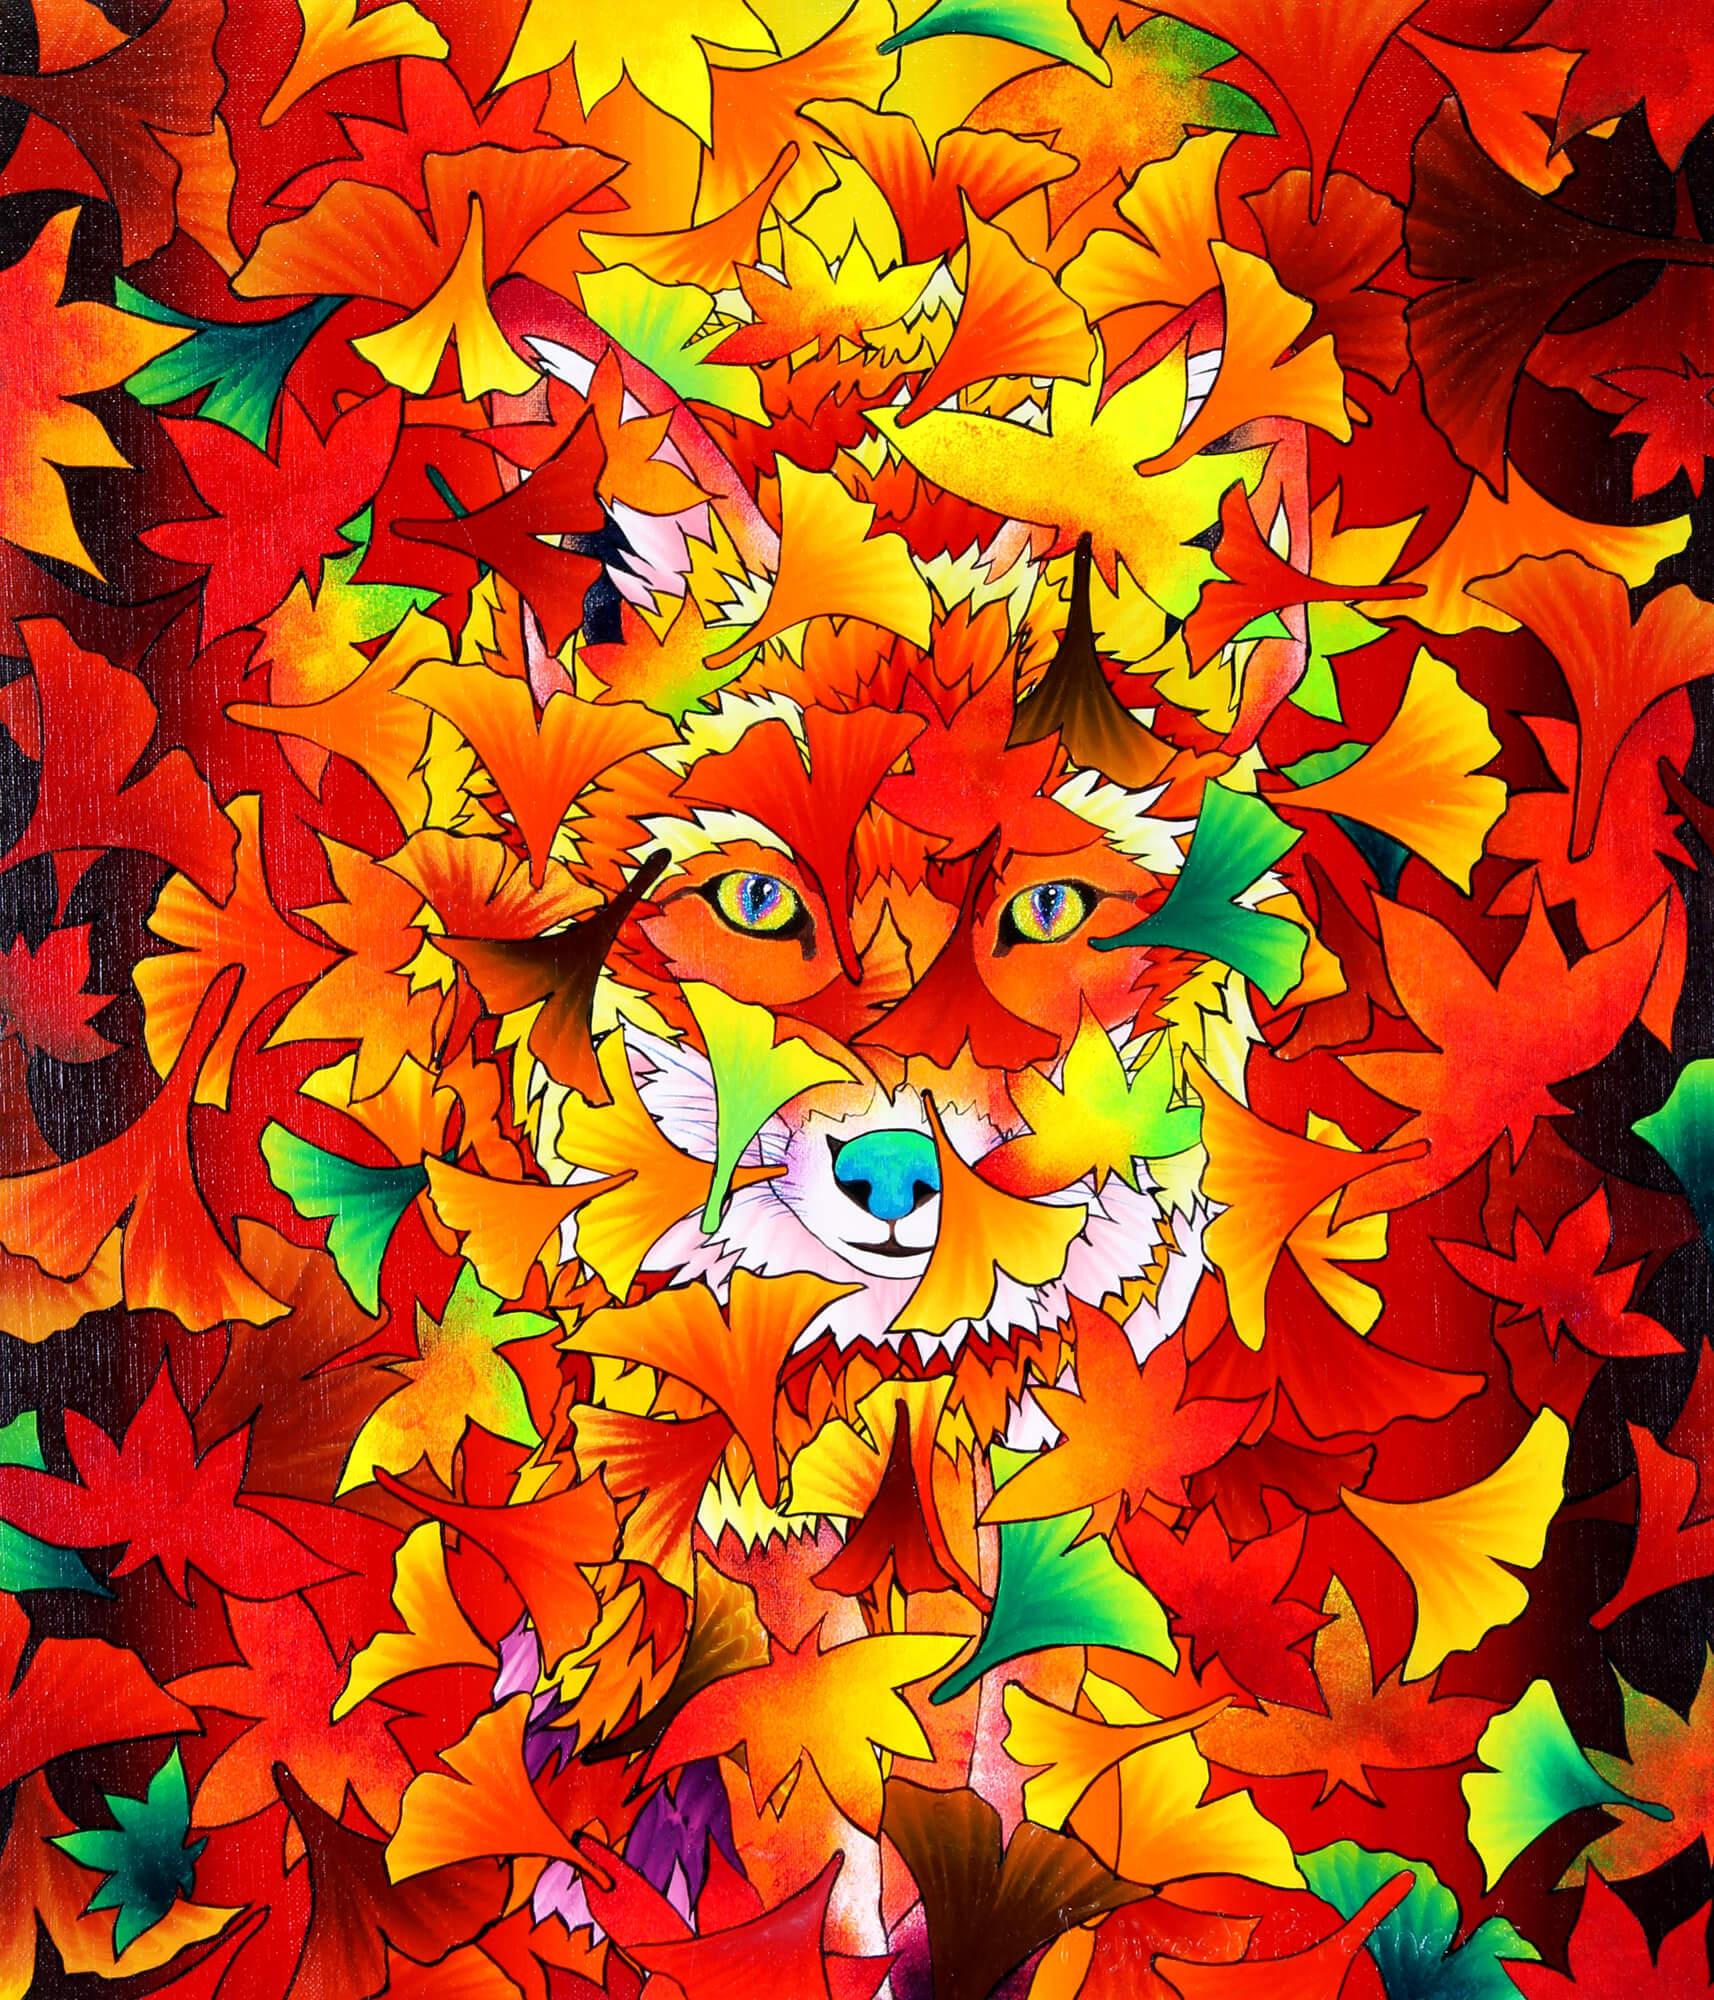 Ginsyu Fox - falling leaves改行 Acrylic,and glitter on canvas, 530×455mm, 2018